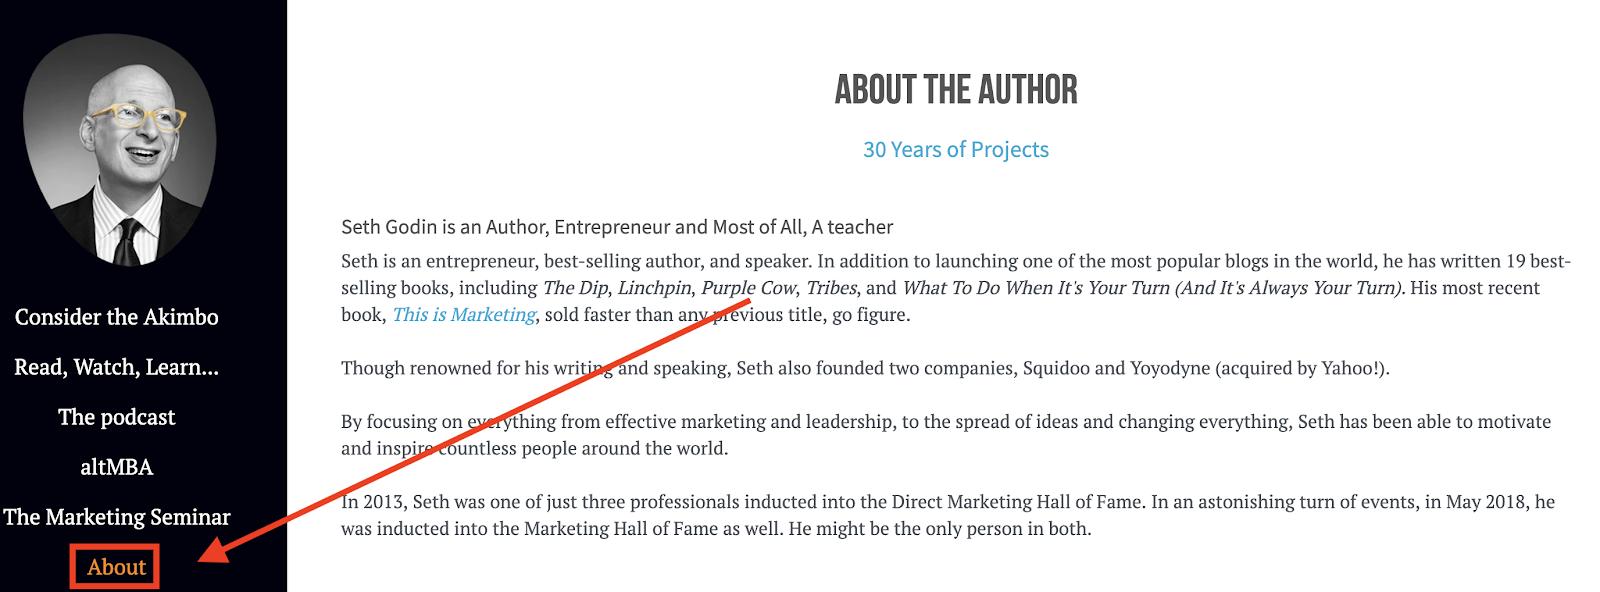 Seth Godin's about page